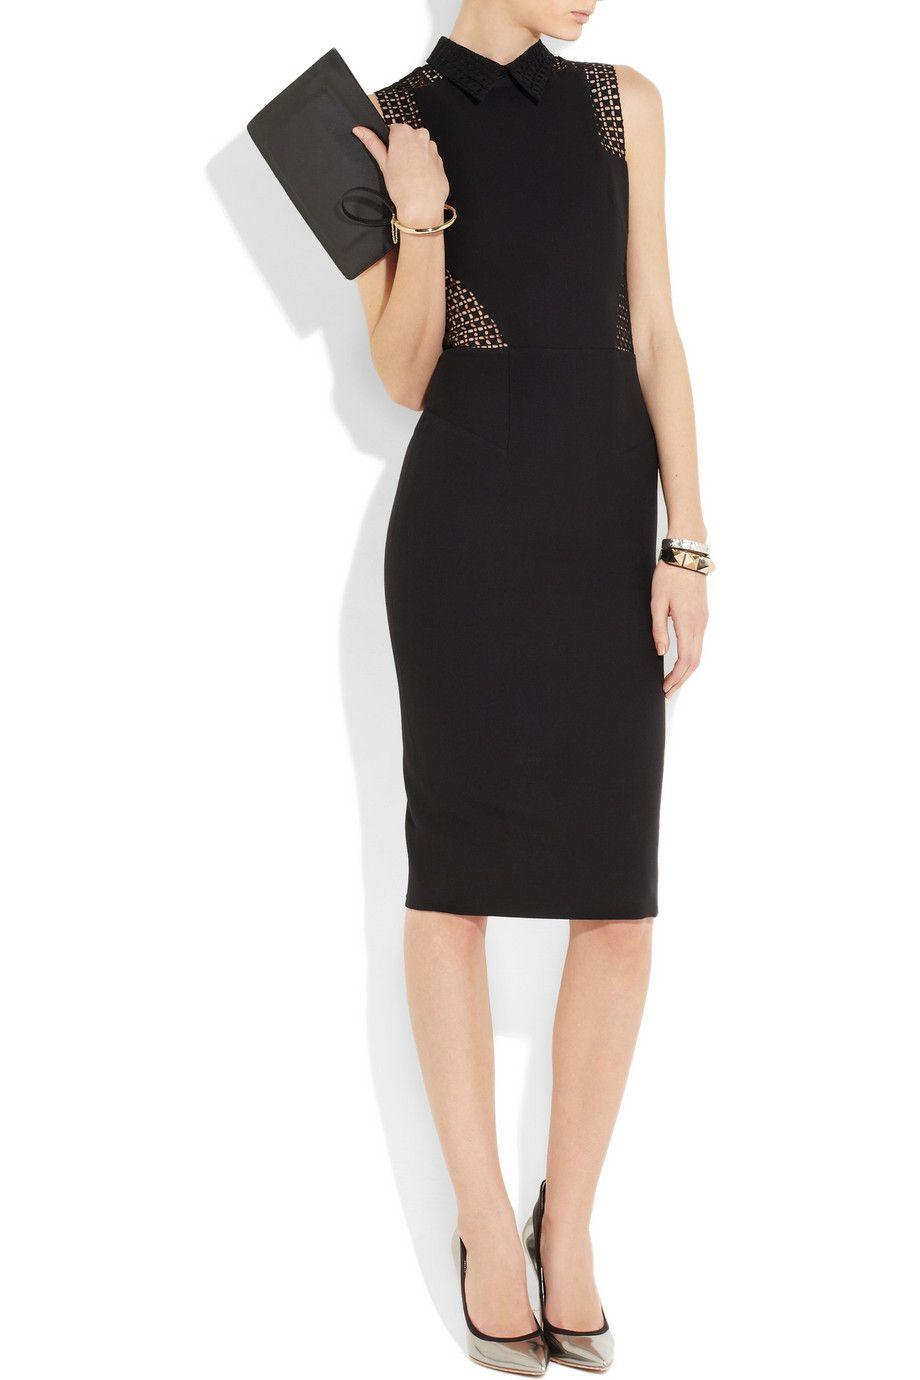 Victoria Beckham Black Broderie Anglaise Paneled Silk And Wool Blend Dress Dresses Little Black Dress Fashion [ 1380 x 920 Pixel ]